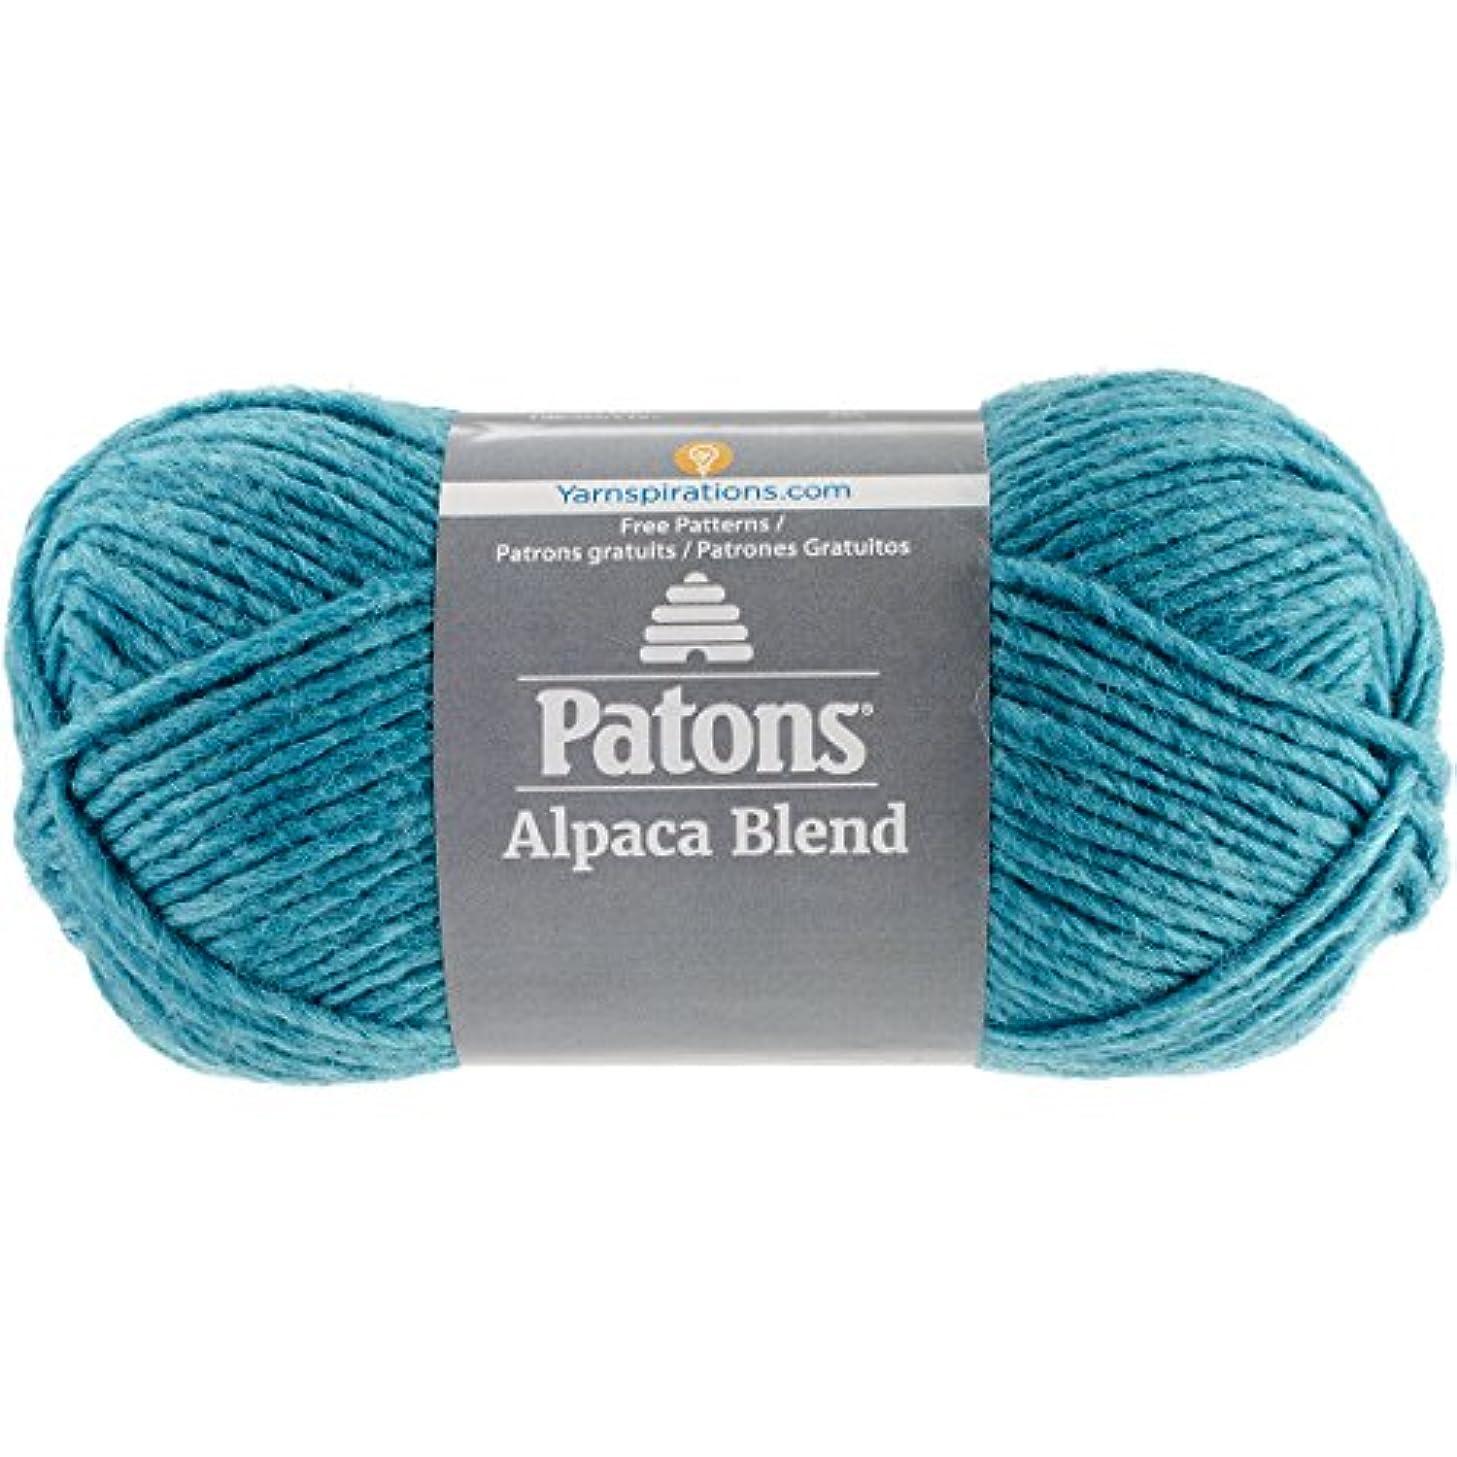 Patons  Alpaca Blend Yarn - (5) Bulky Gauge  - 3.5oz -  Aquamarine -  Machine Washable  For Crochet, Knitting & Crafting